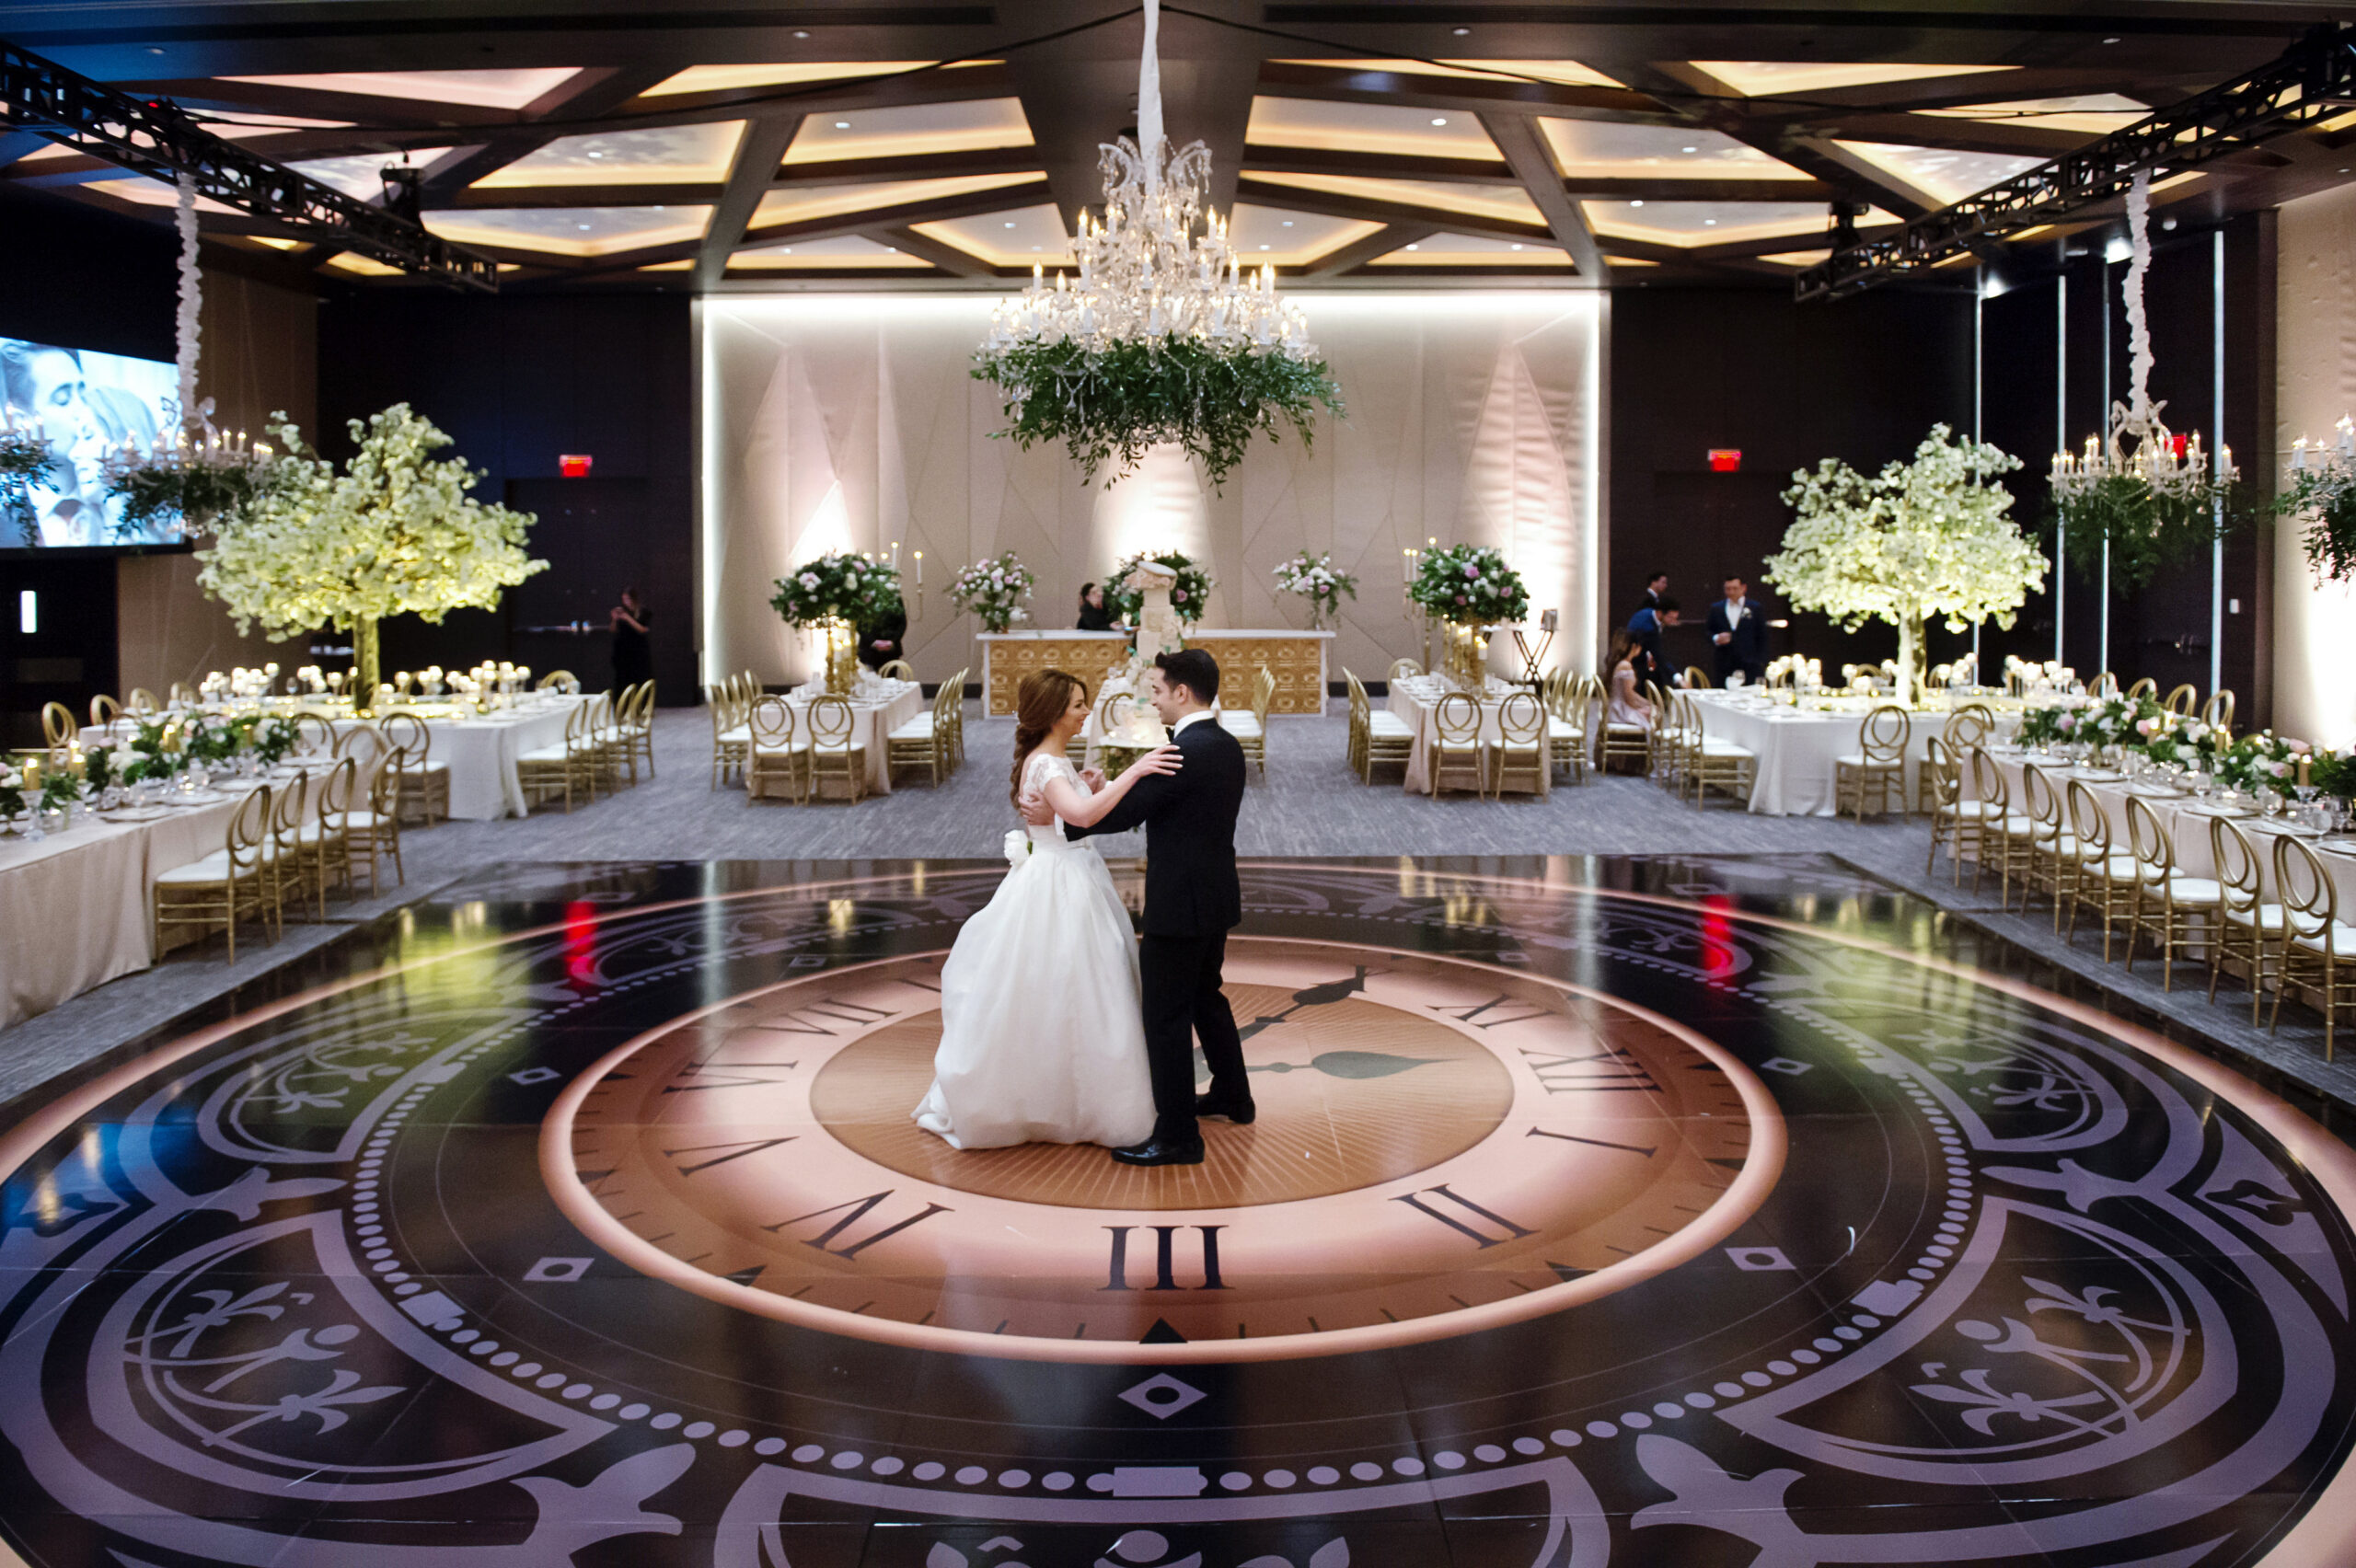 https://secureservercdn.net/45.40.145.151/kgq.ab5.myftpupload.com/wp-content/uploads/2020/04/Sanam-Soroush-s-Wedding-wedluxe-submission-0102-scaled.jpg?time=1634407926